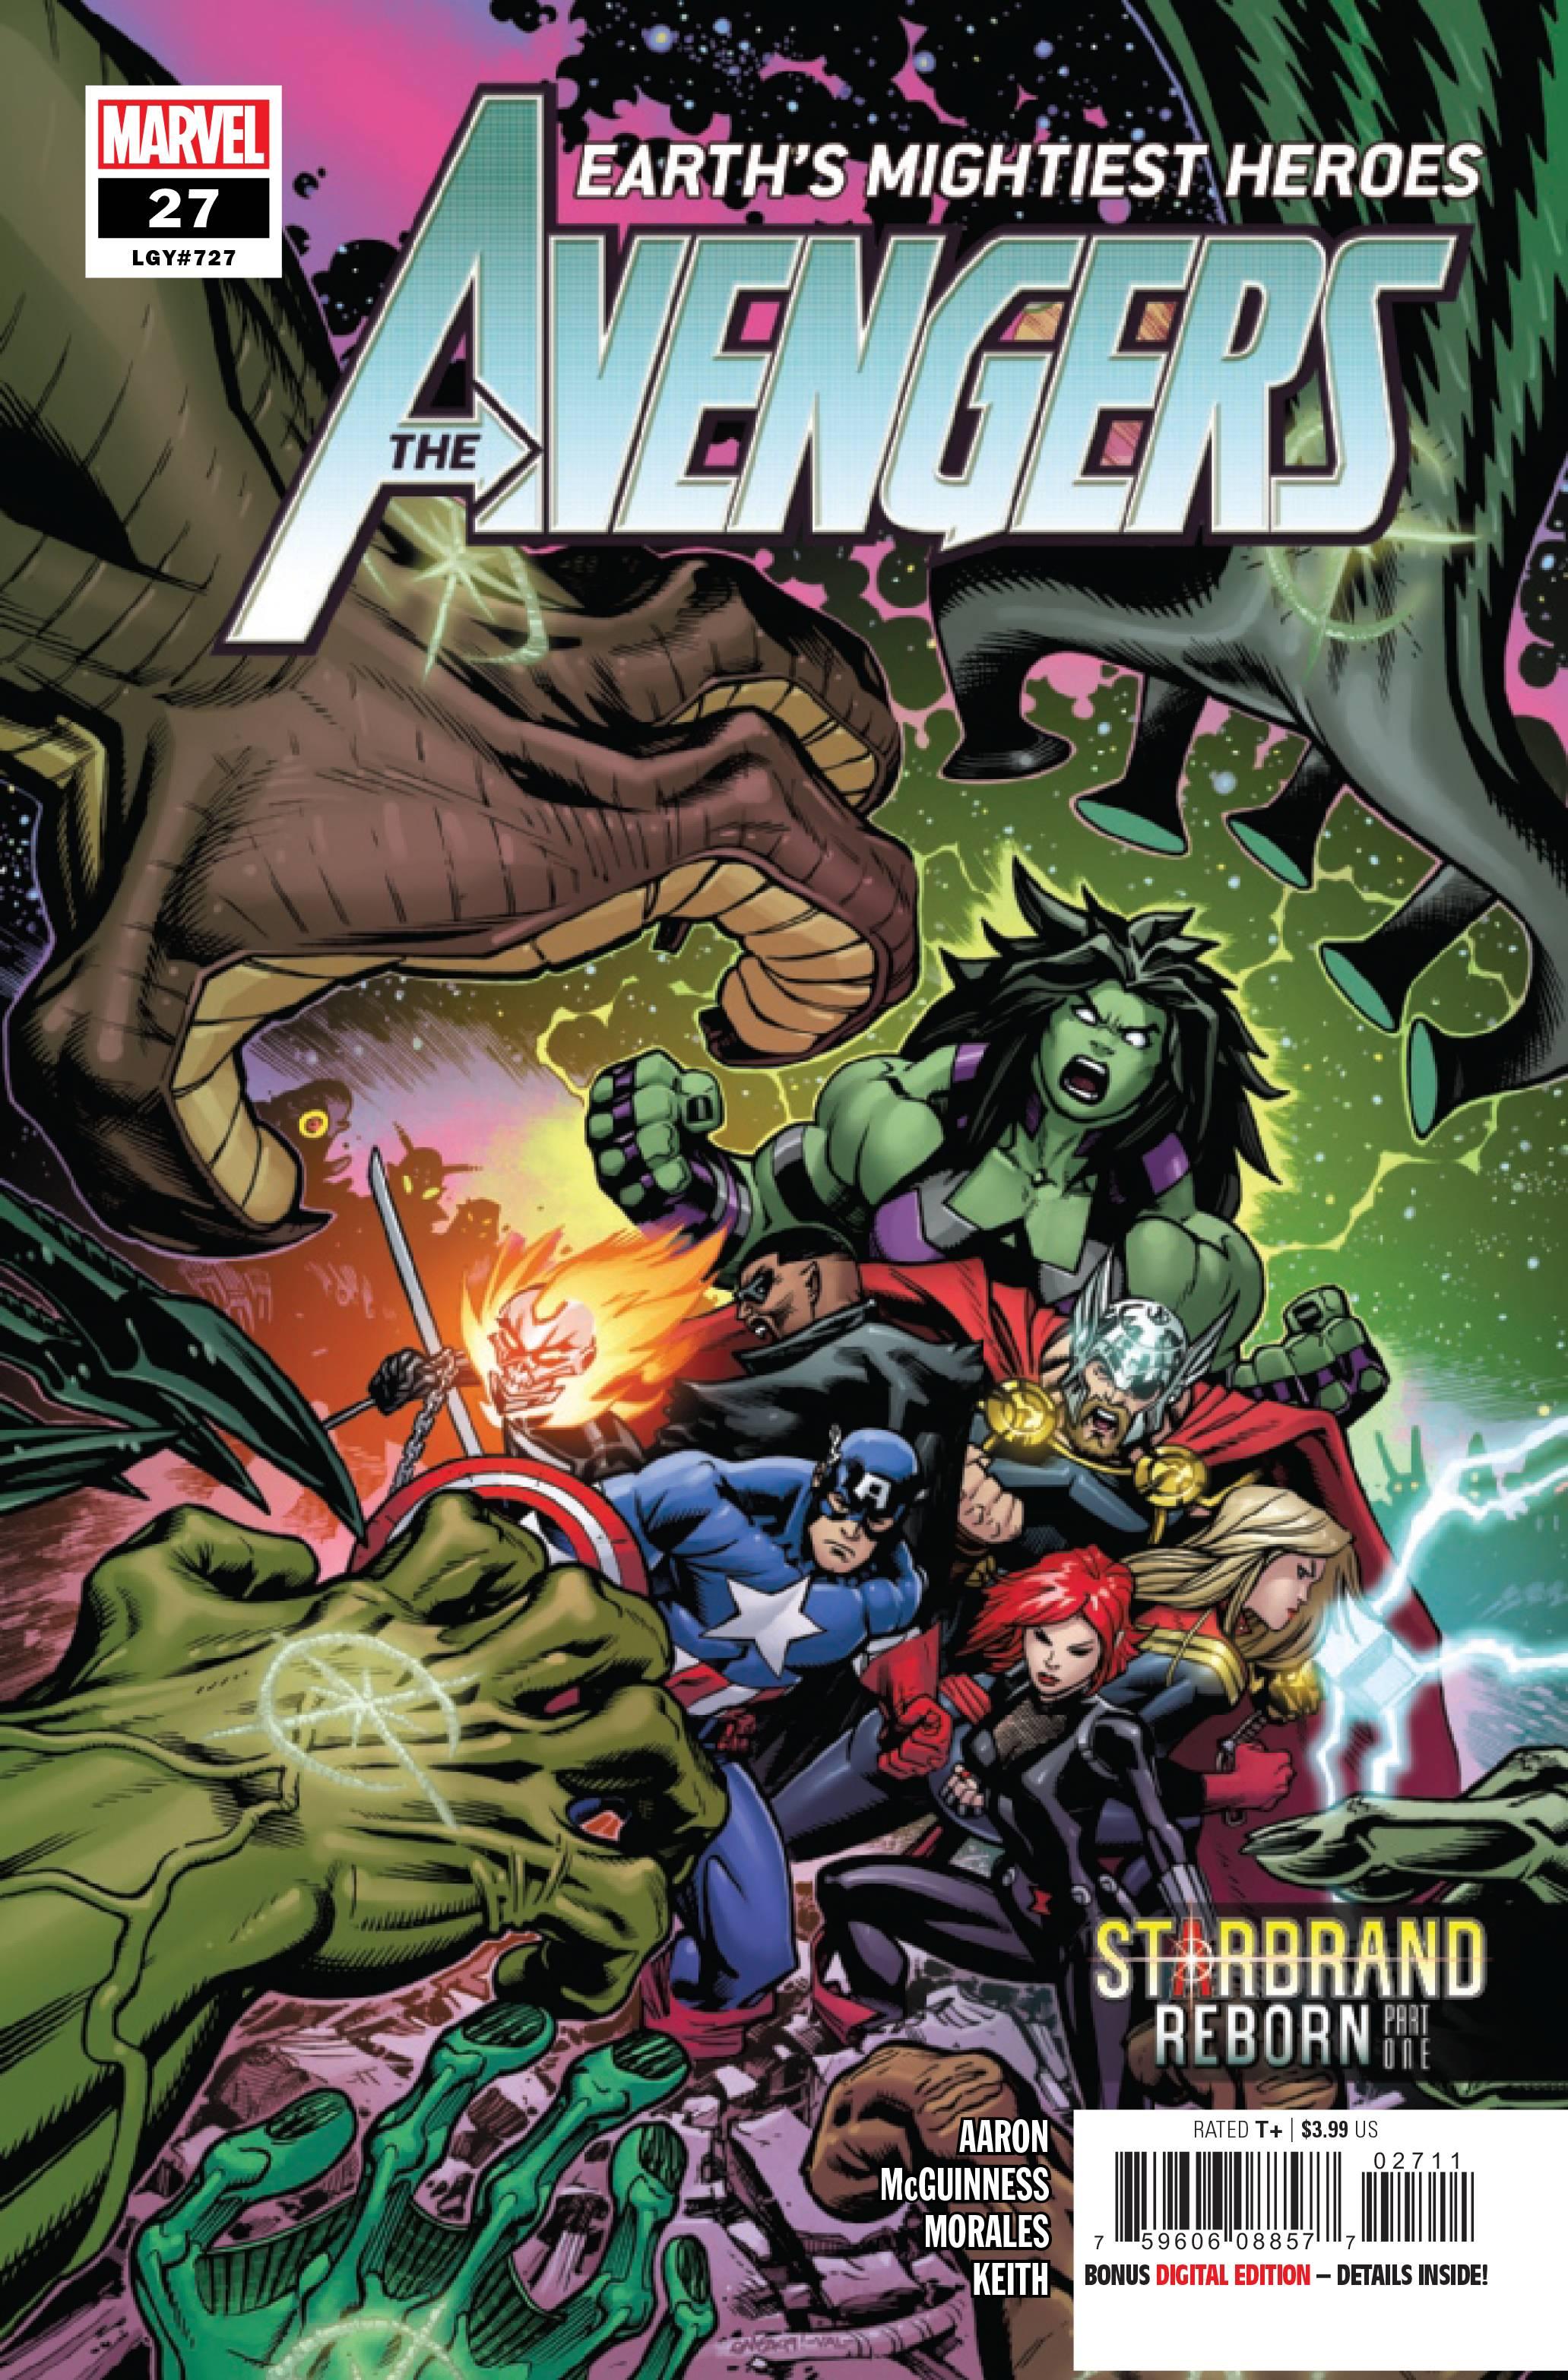 Avengers: Earth's Mightiest Heroes #27 (2019)